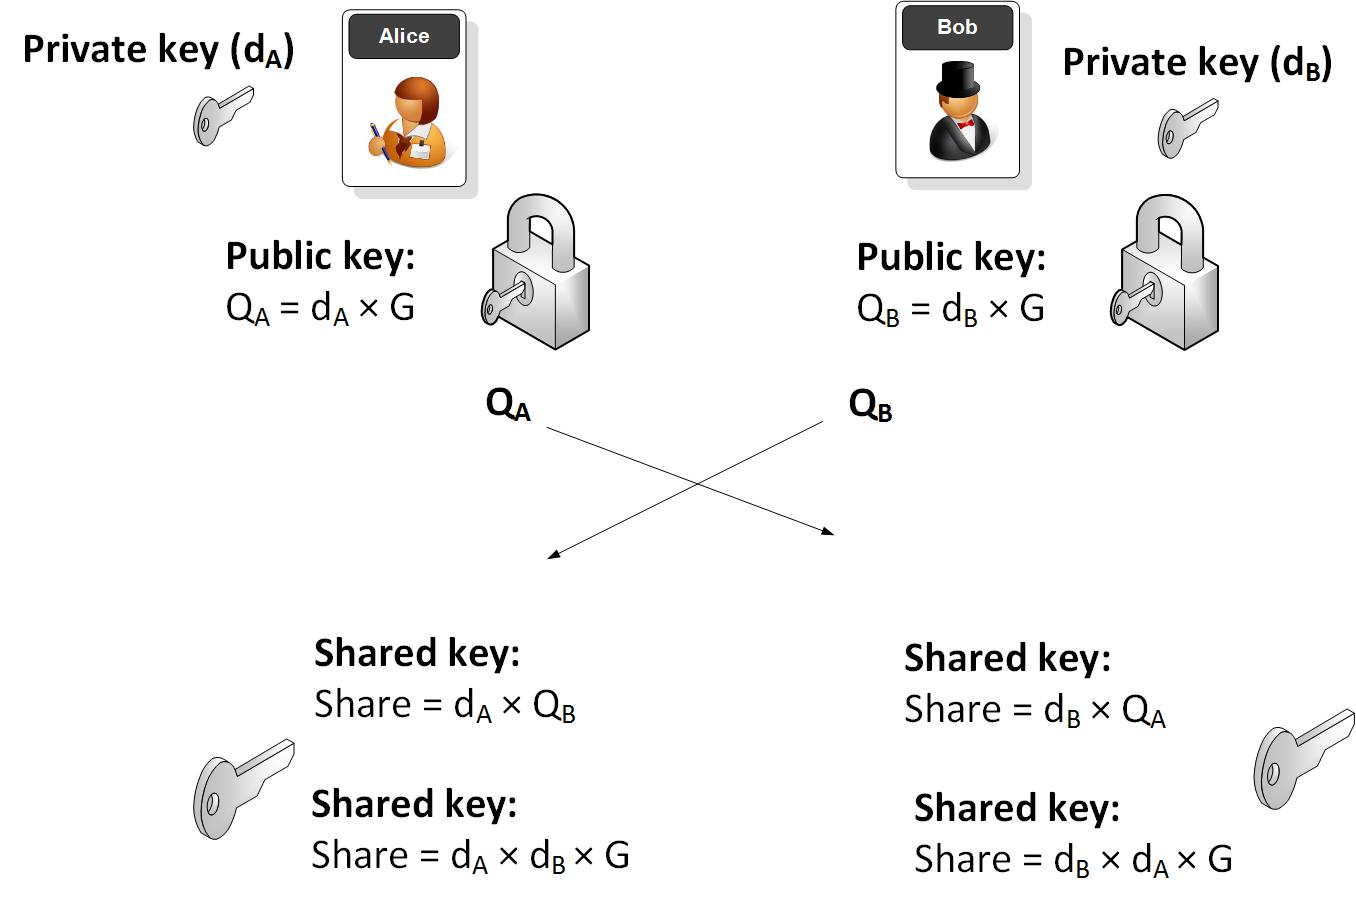 ECDH key share的图片搜寻结果